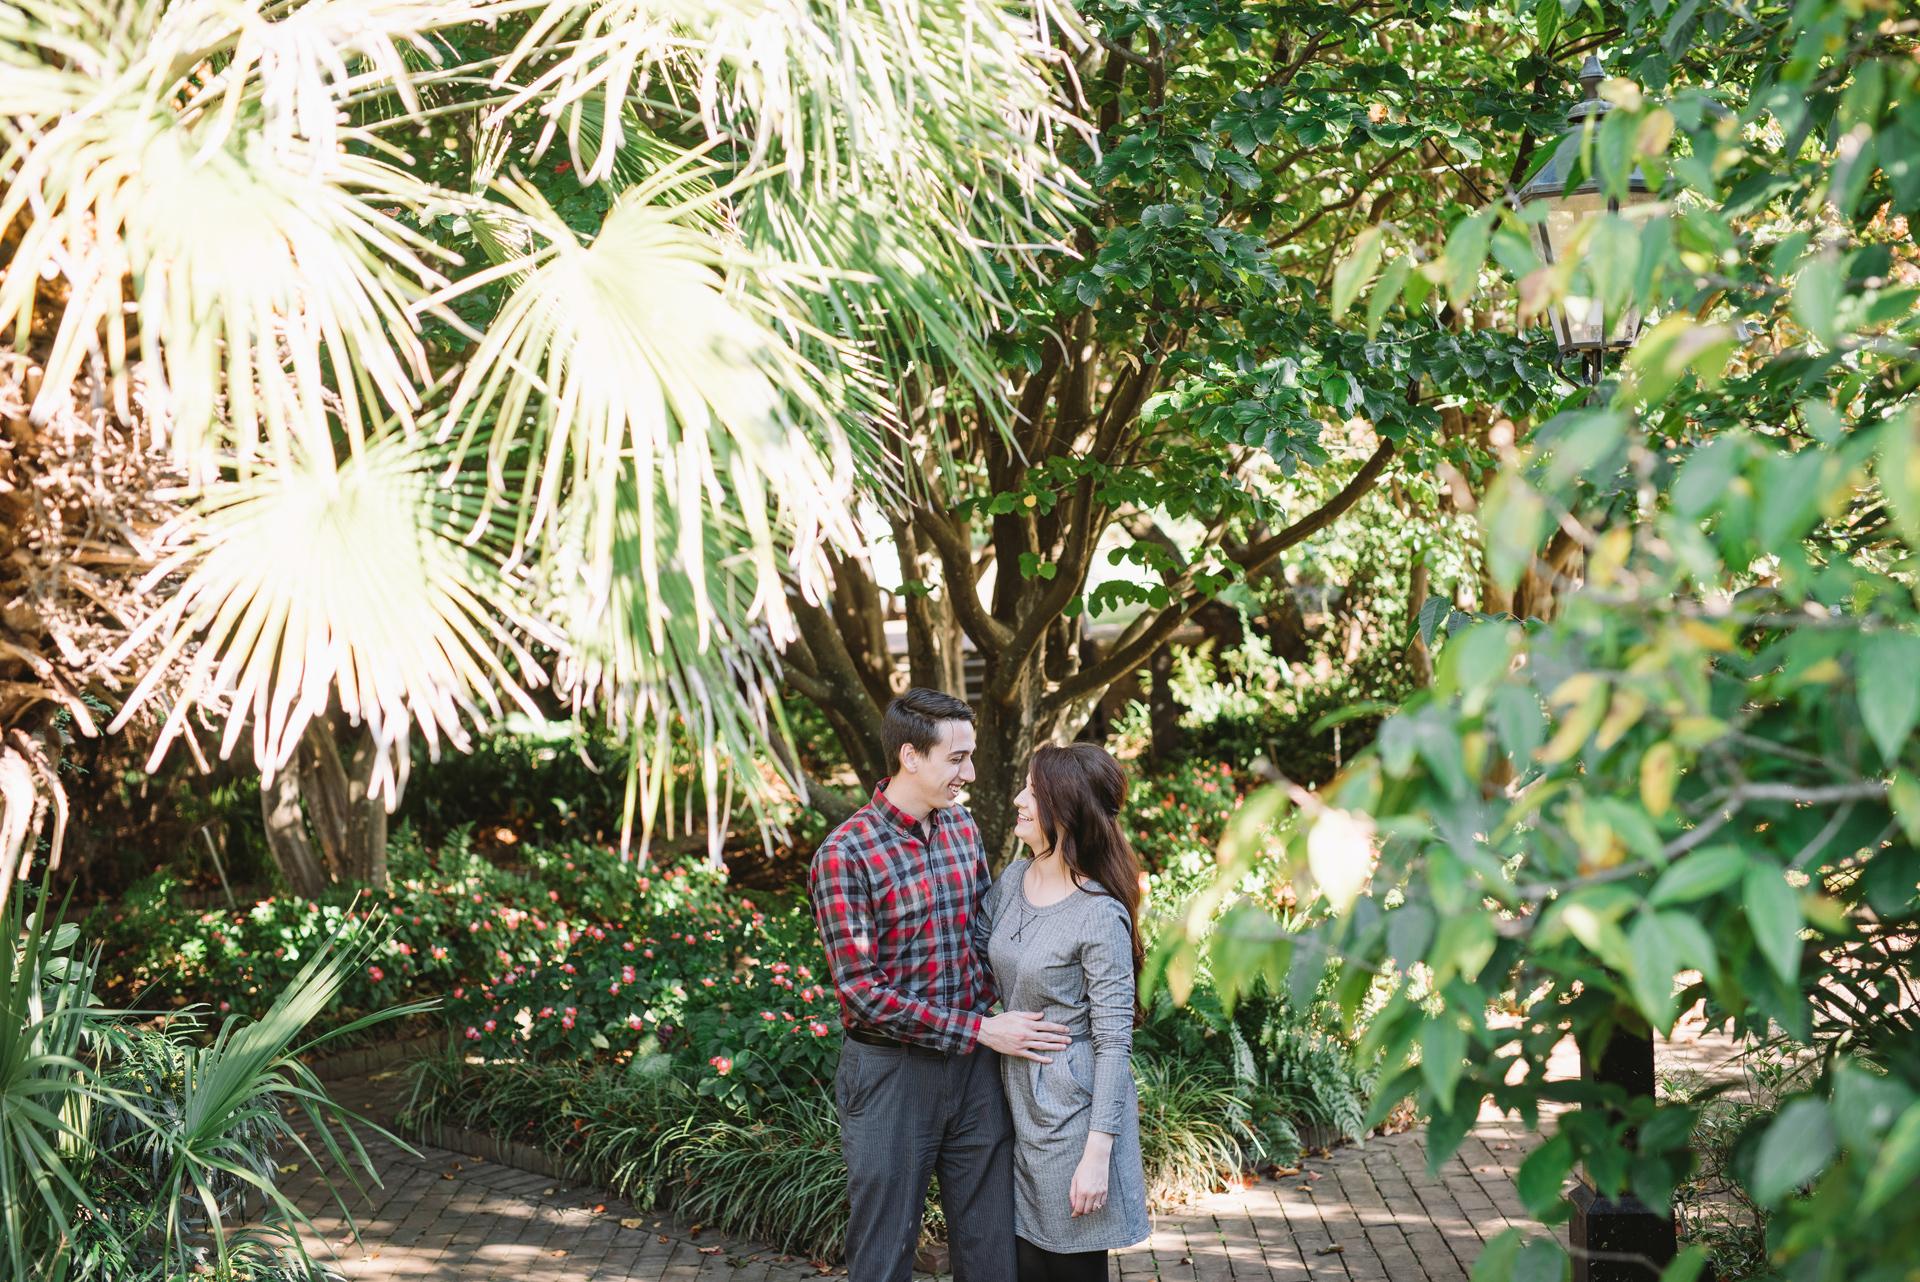 kae-andrew-engagement-session-riverbanks-zoo-botanical-gardens